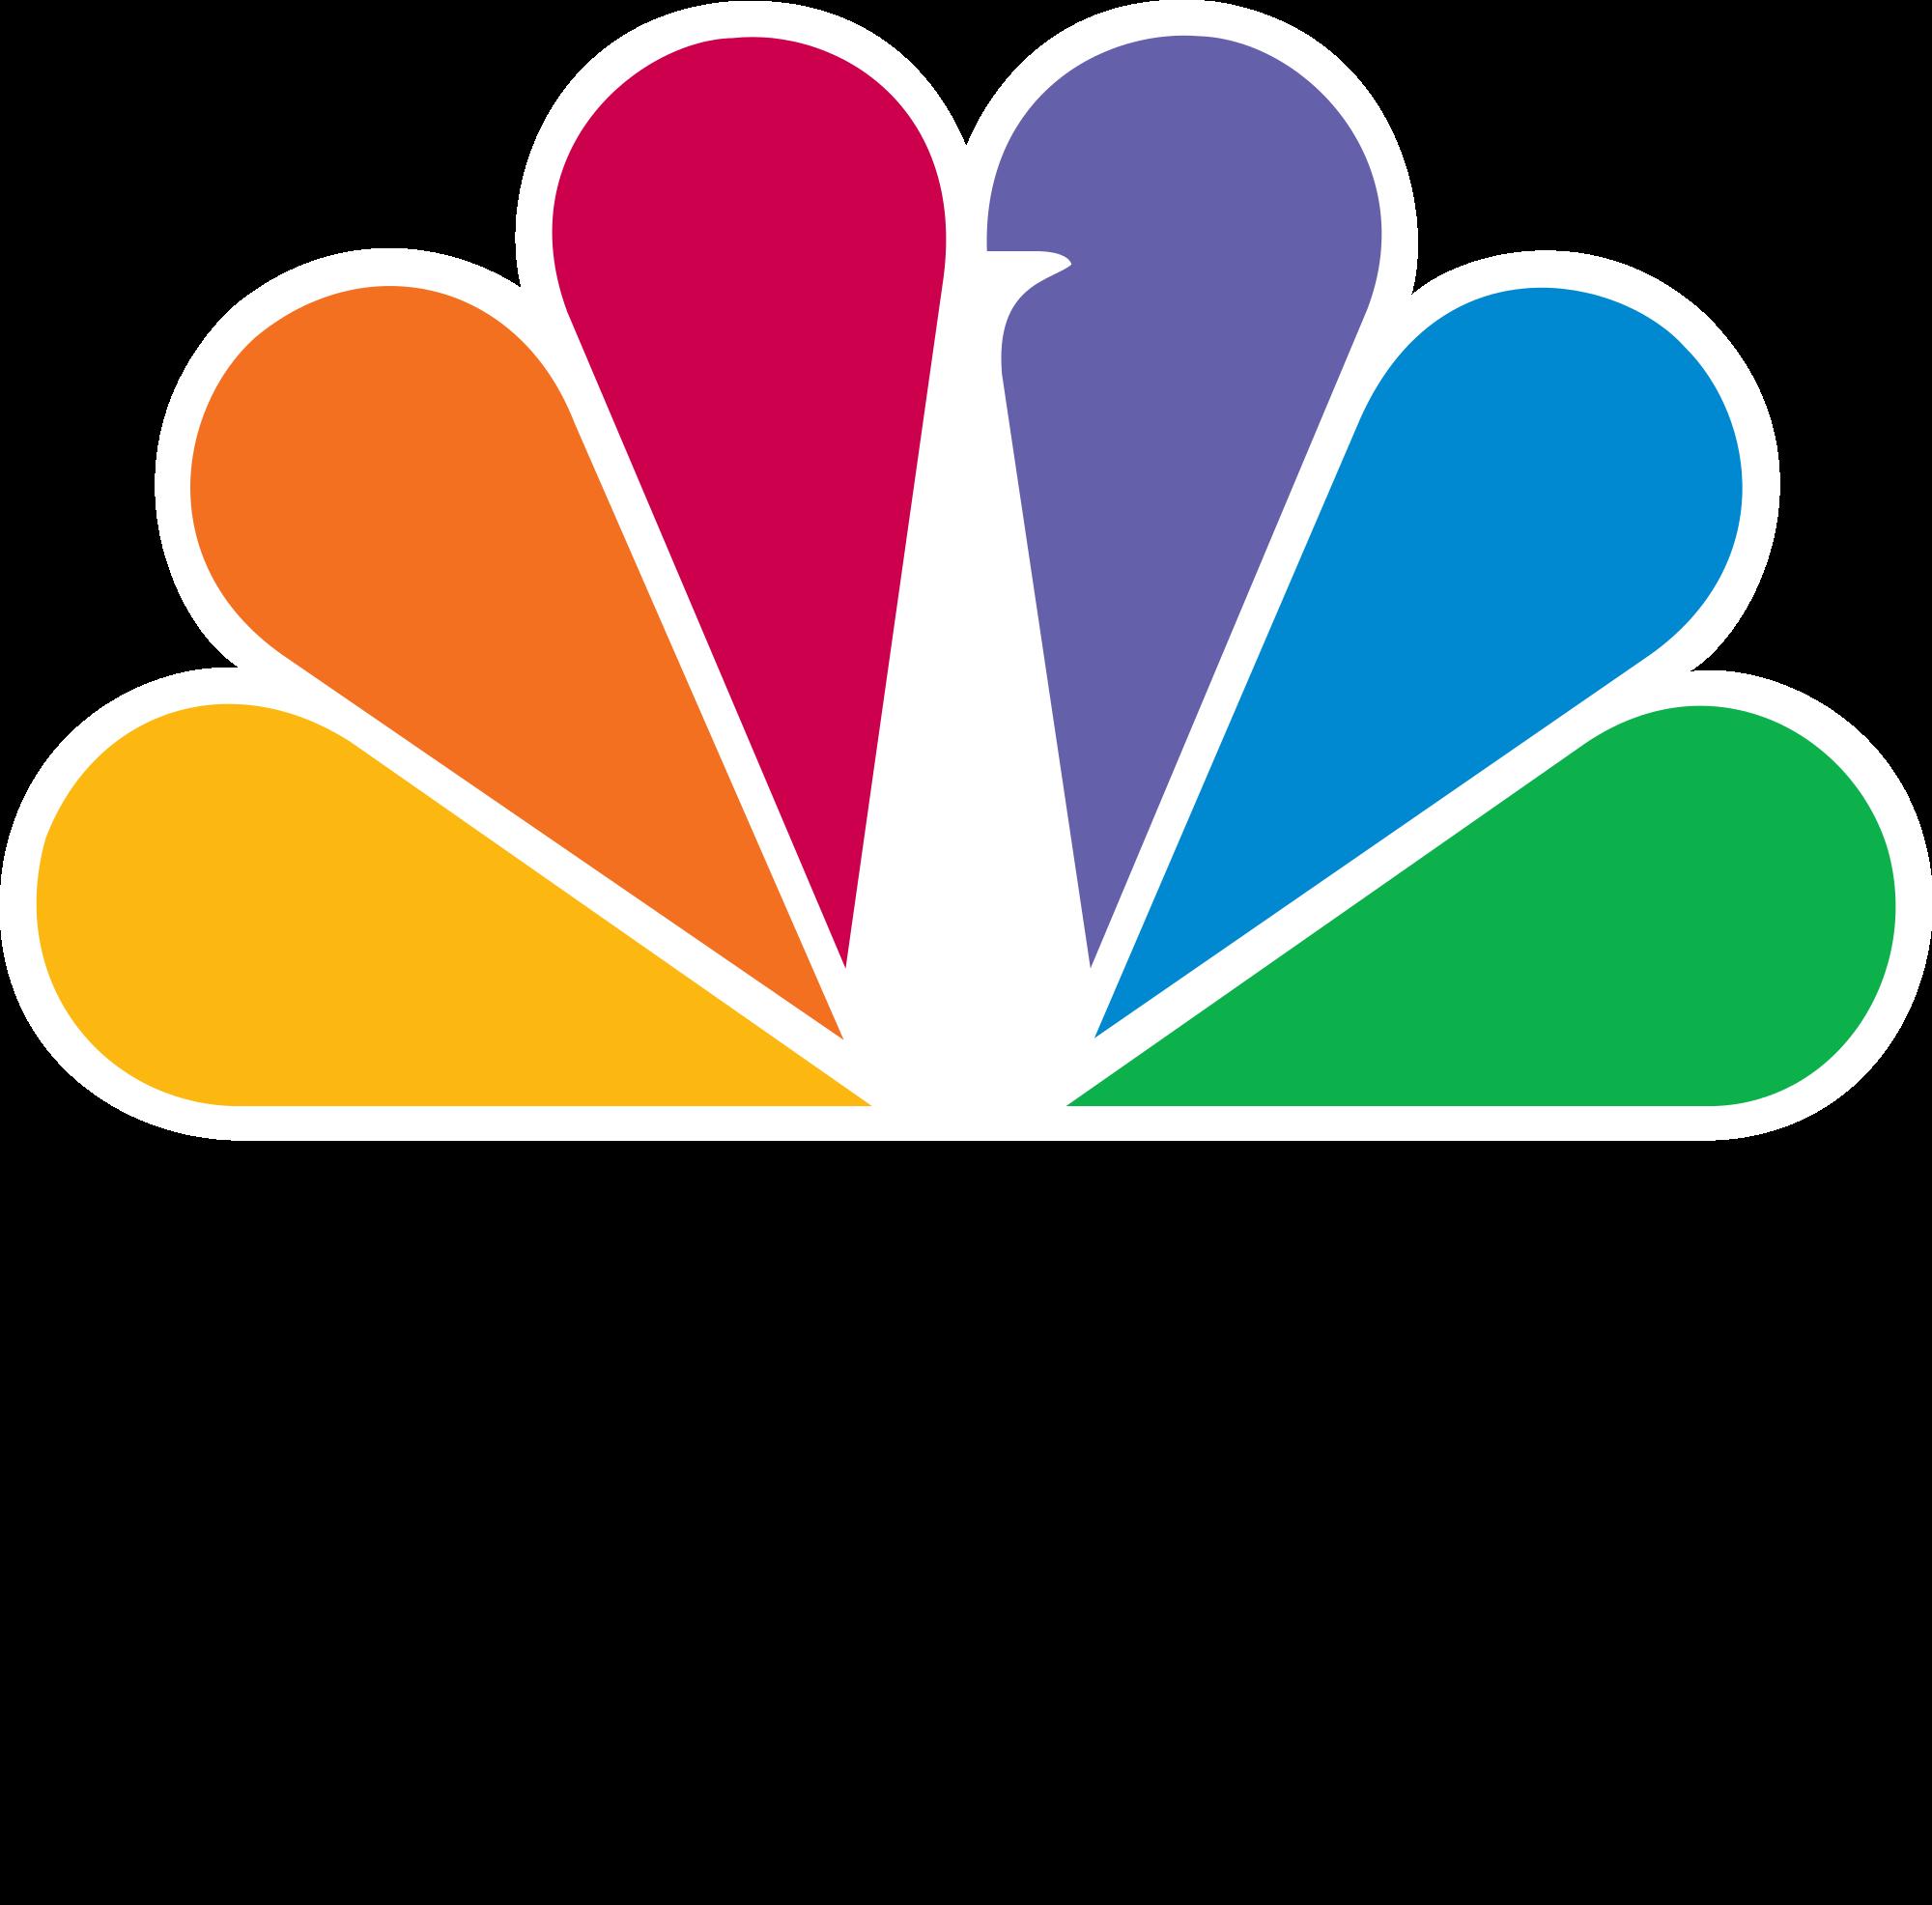 HQ Logo Wallpapers | File 159.73Kb